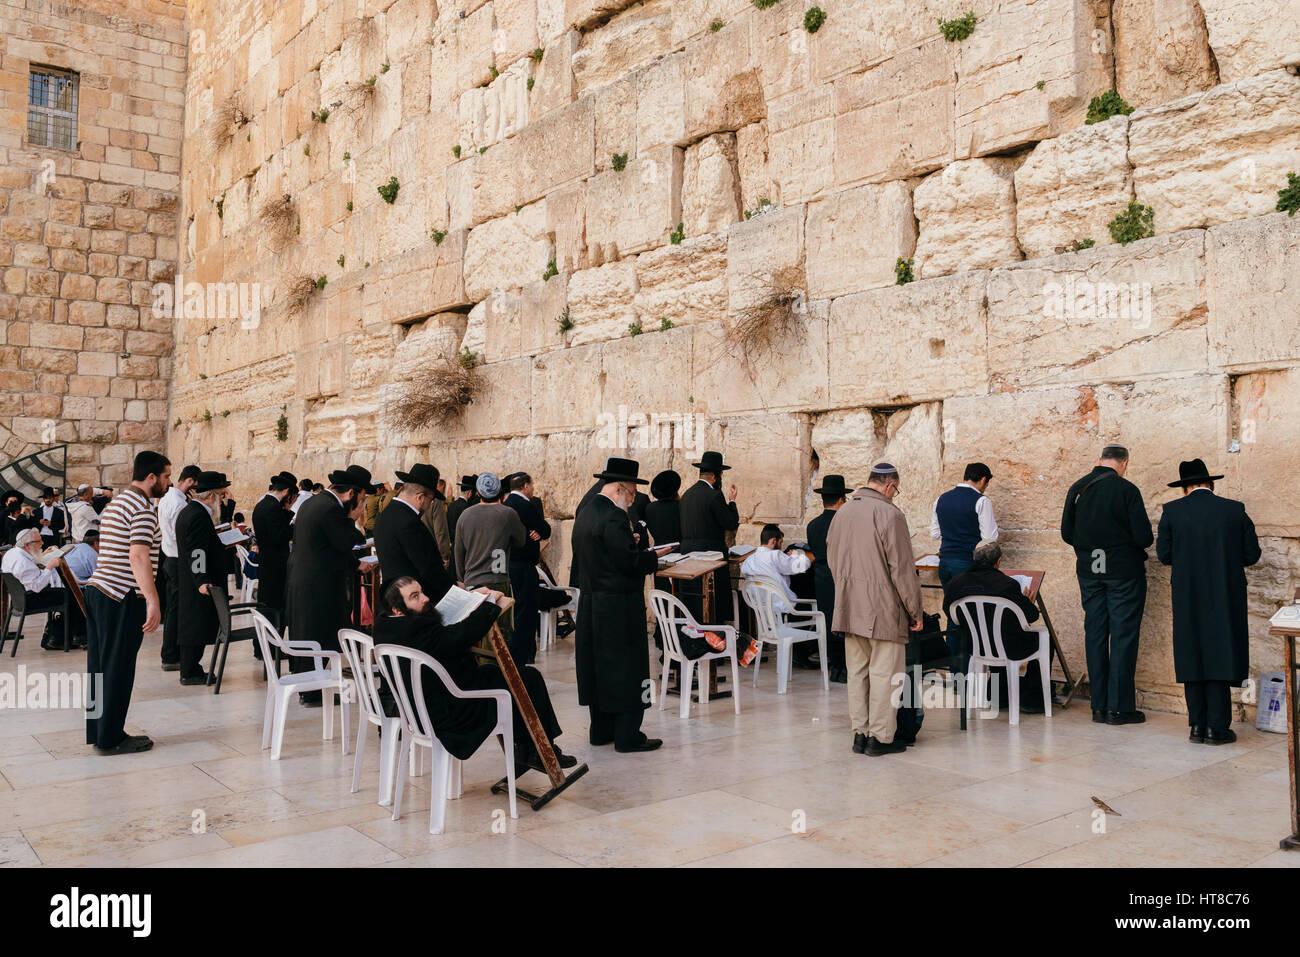 wailing-wall-jerusalem-israel-HT8C76.jpg